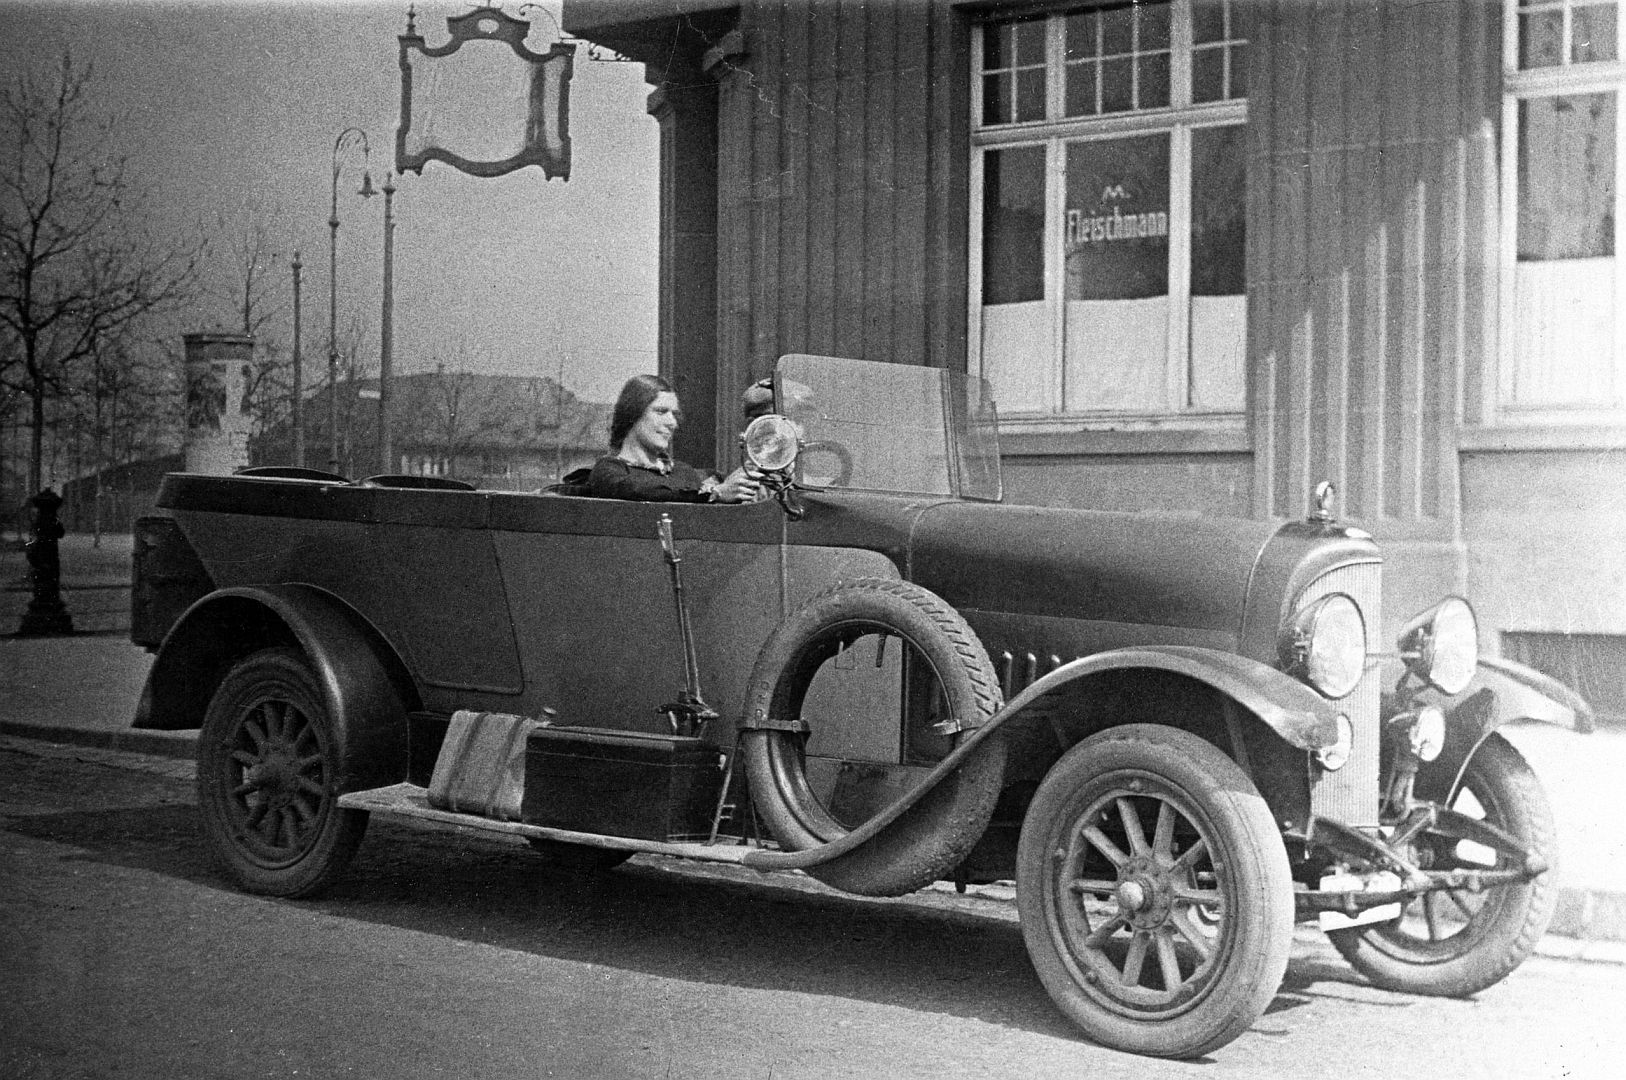 Stoewer_D5_a_04-1925_Galerie